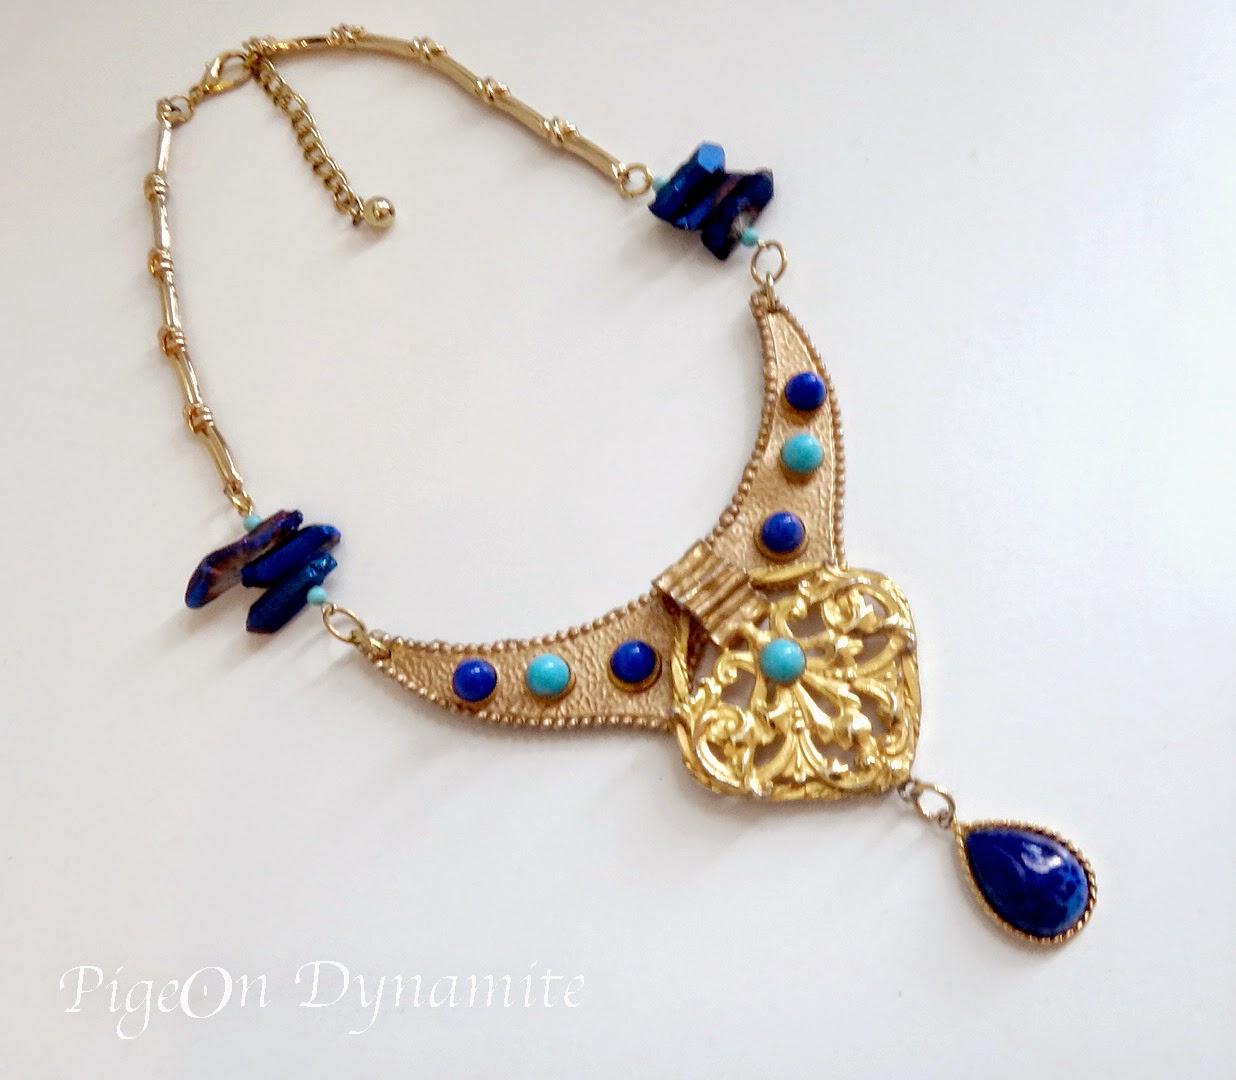 https://www.etsy.com/listing/223001610/custom-onik-vintage-statement-necklace?ref=shop_home_active_20